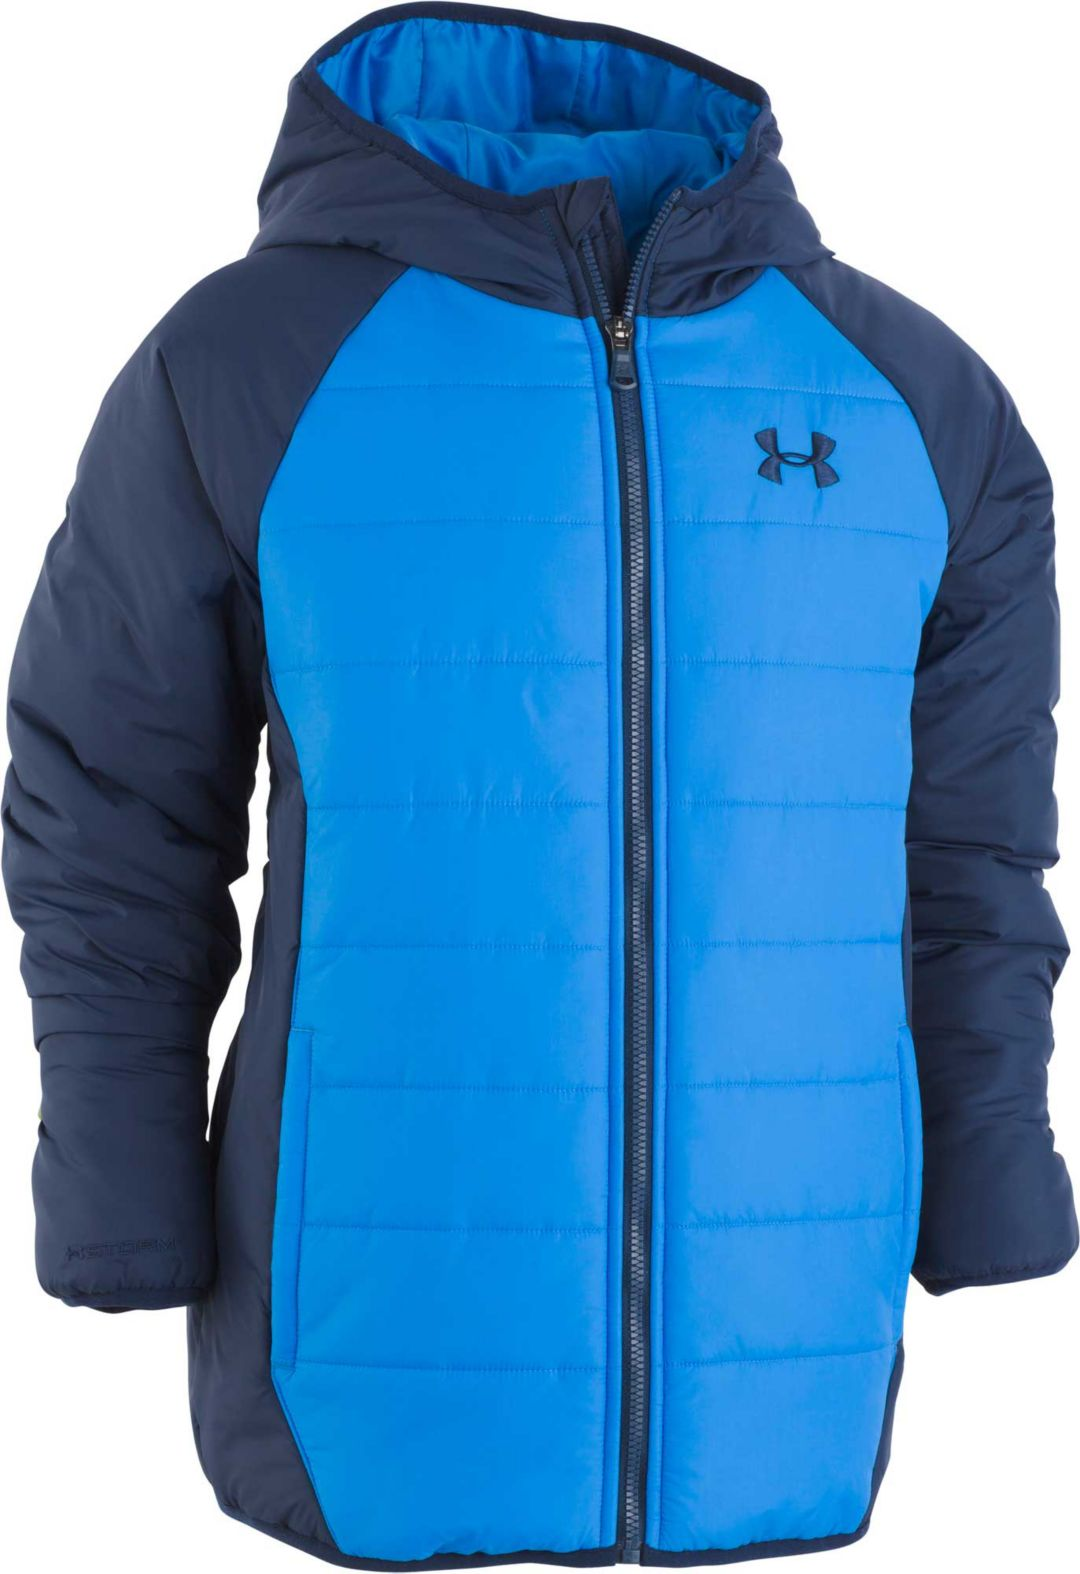 5055bb3caafa4 Under Armour Toddler Boys' Tuckerman Puffer Jacket | DICK'S Sporting ...